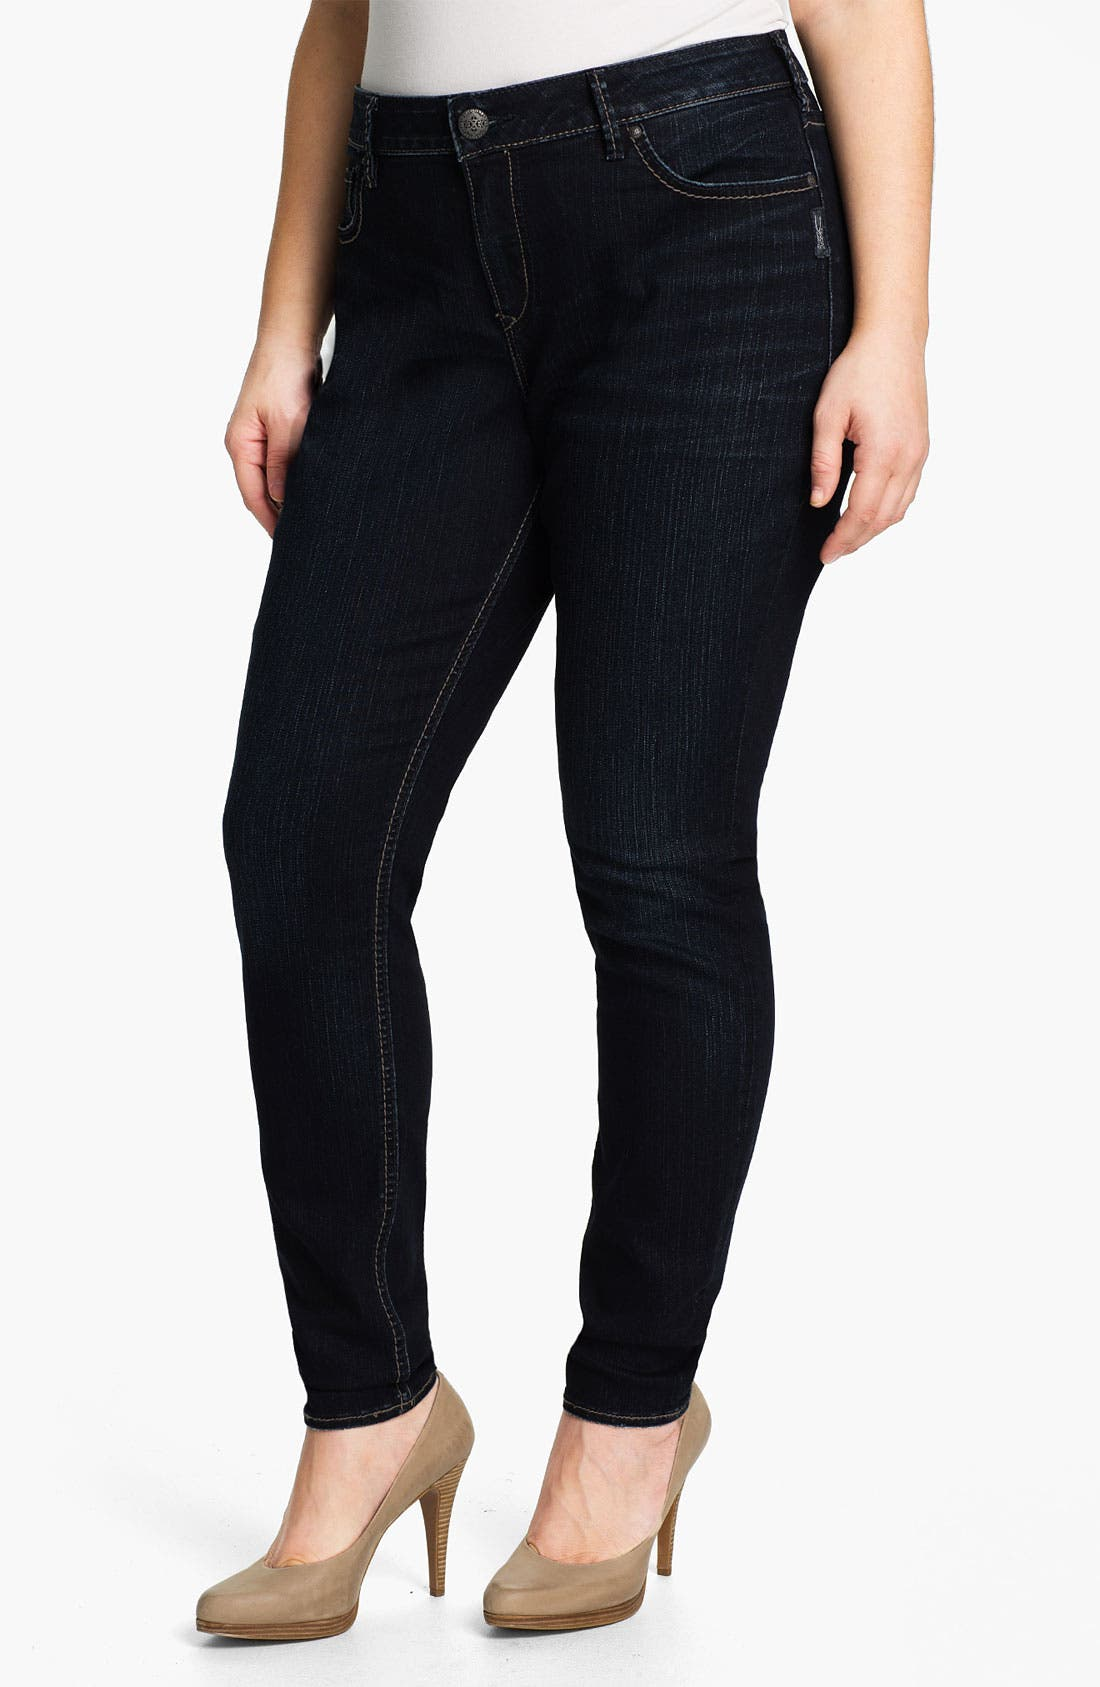 Alternate Image 1 Selected - Silver Jeans Co. 'Stevie' Denim Leggings (Plus)